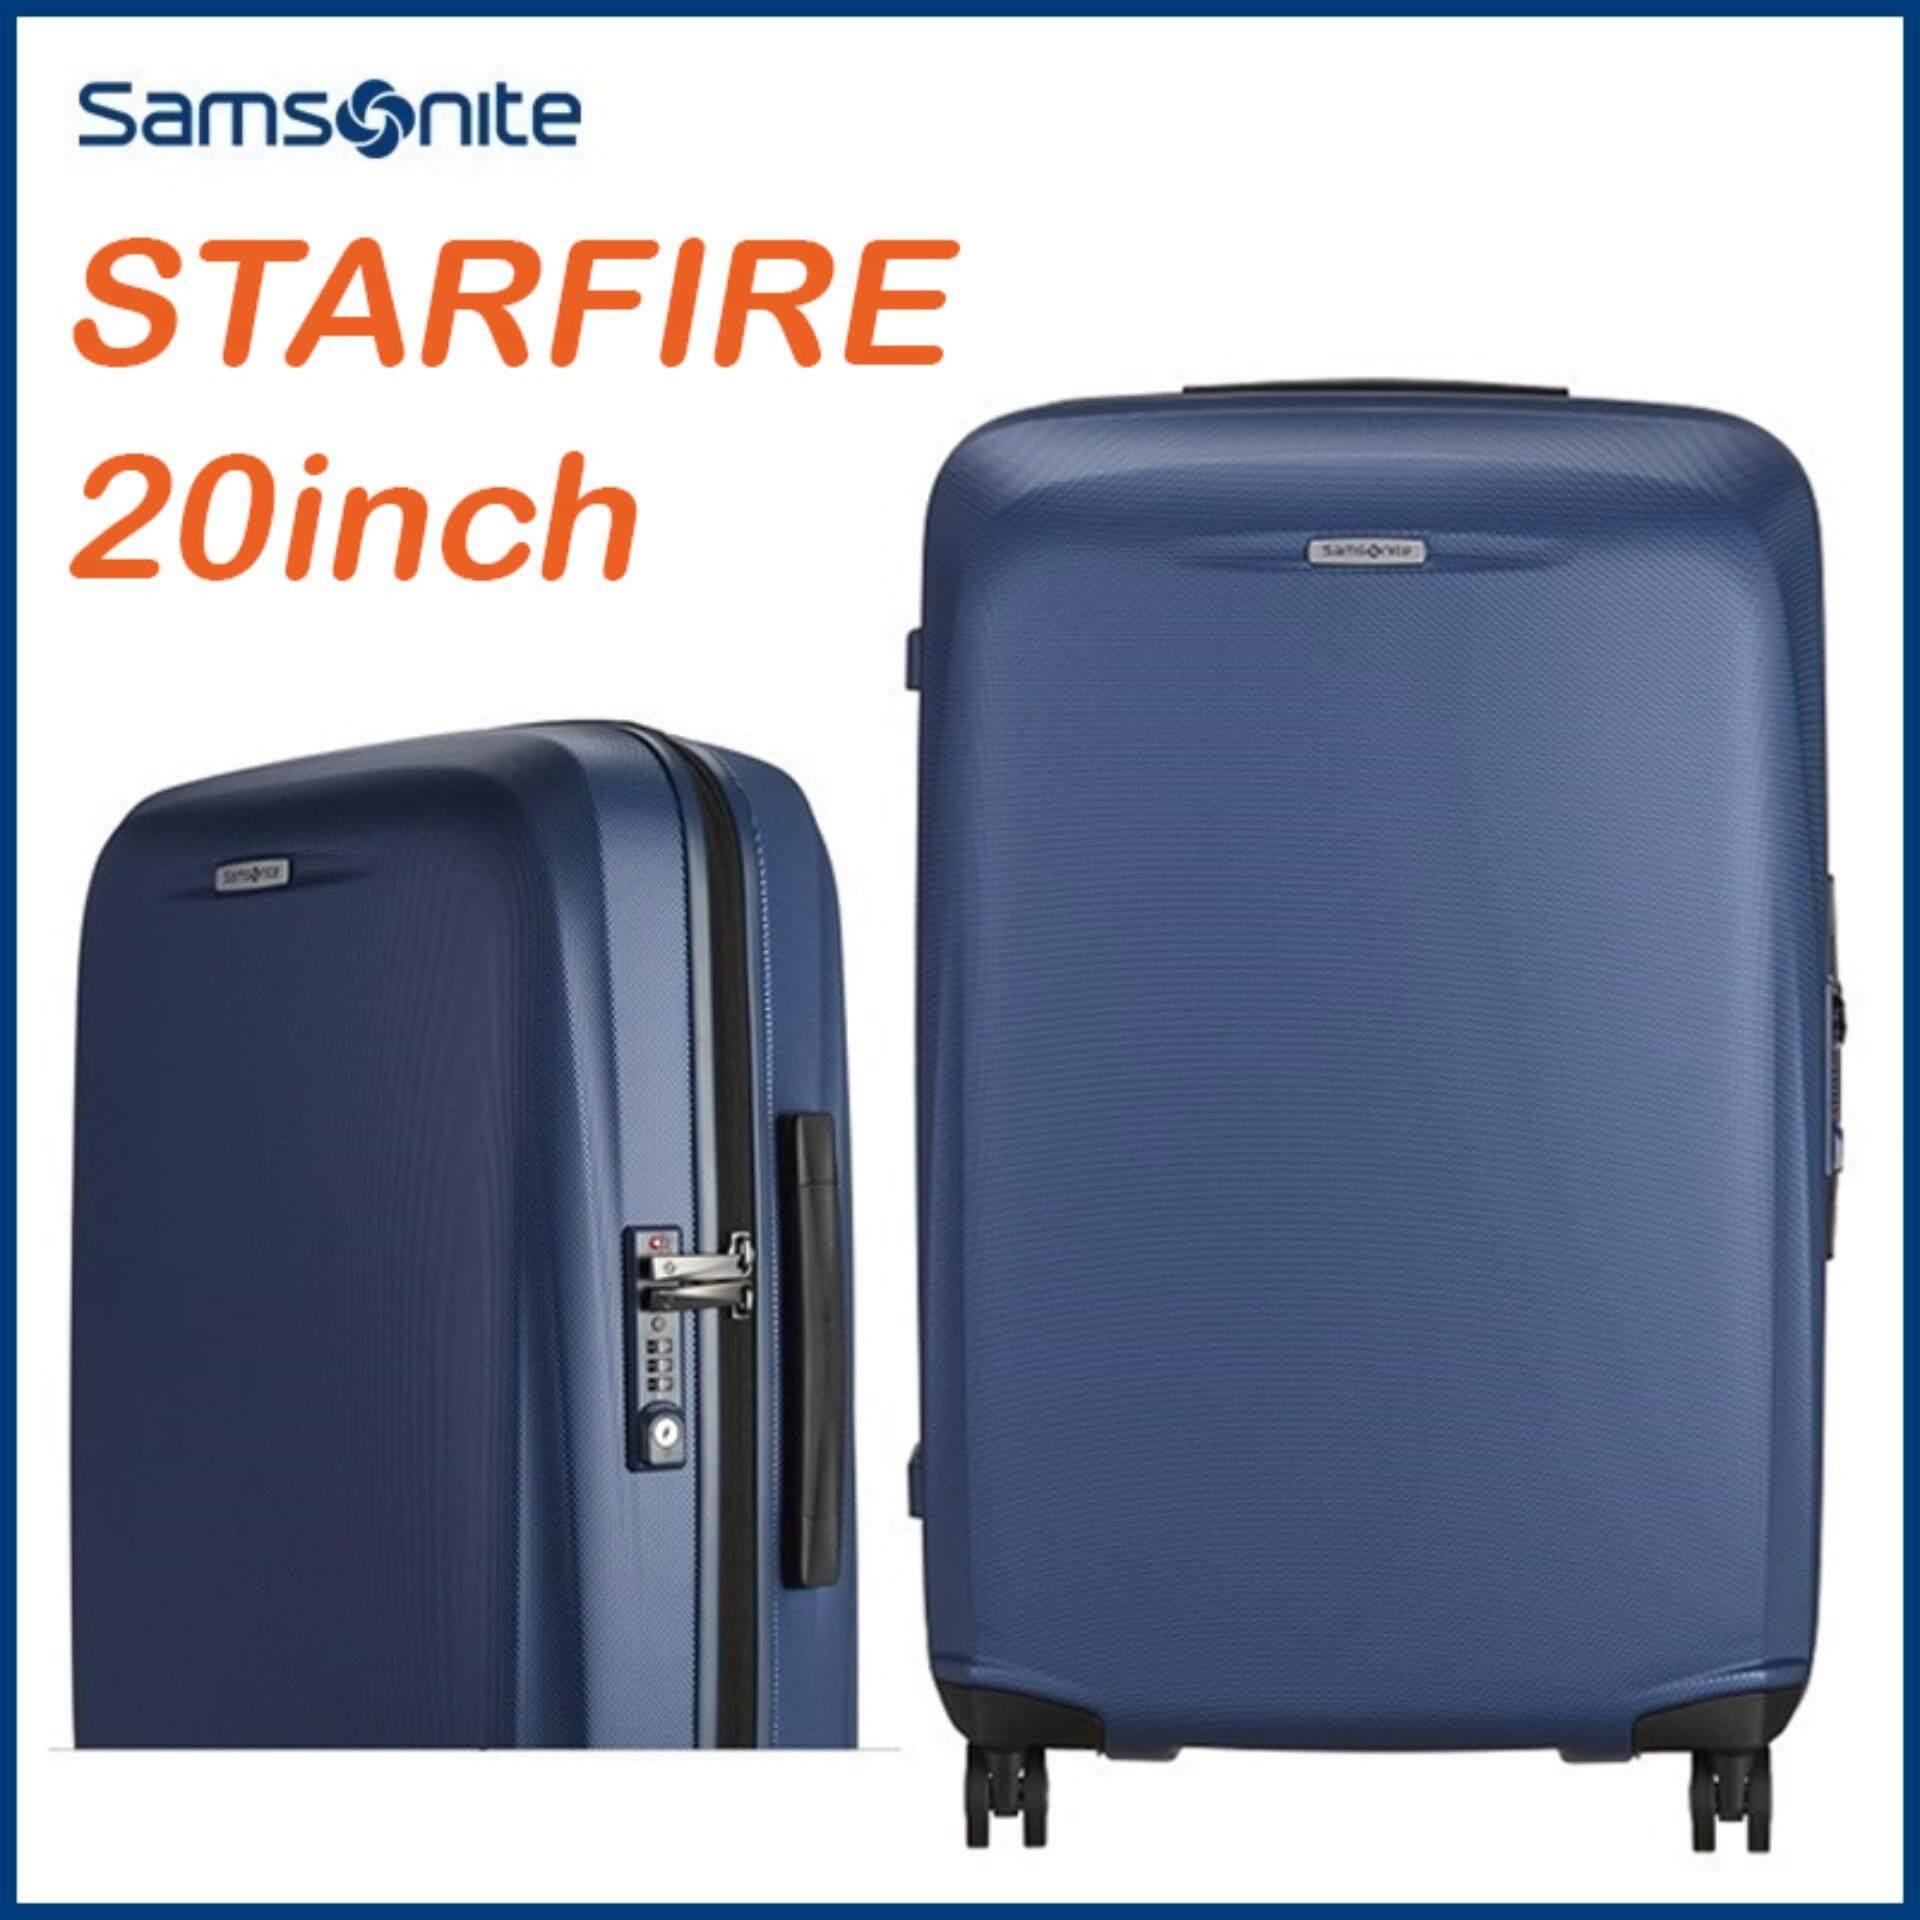 5c2764972d59 Samsonite Fomma Laptop Strolley Bag- Fenix Toulouse Handball